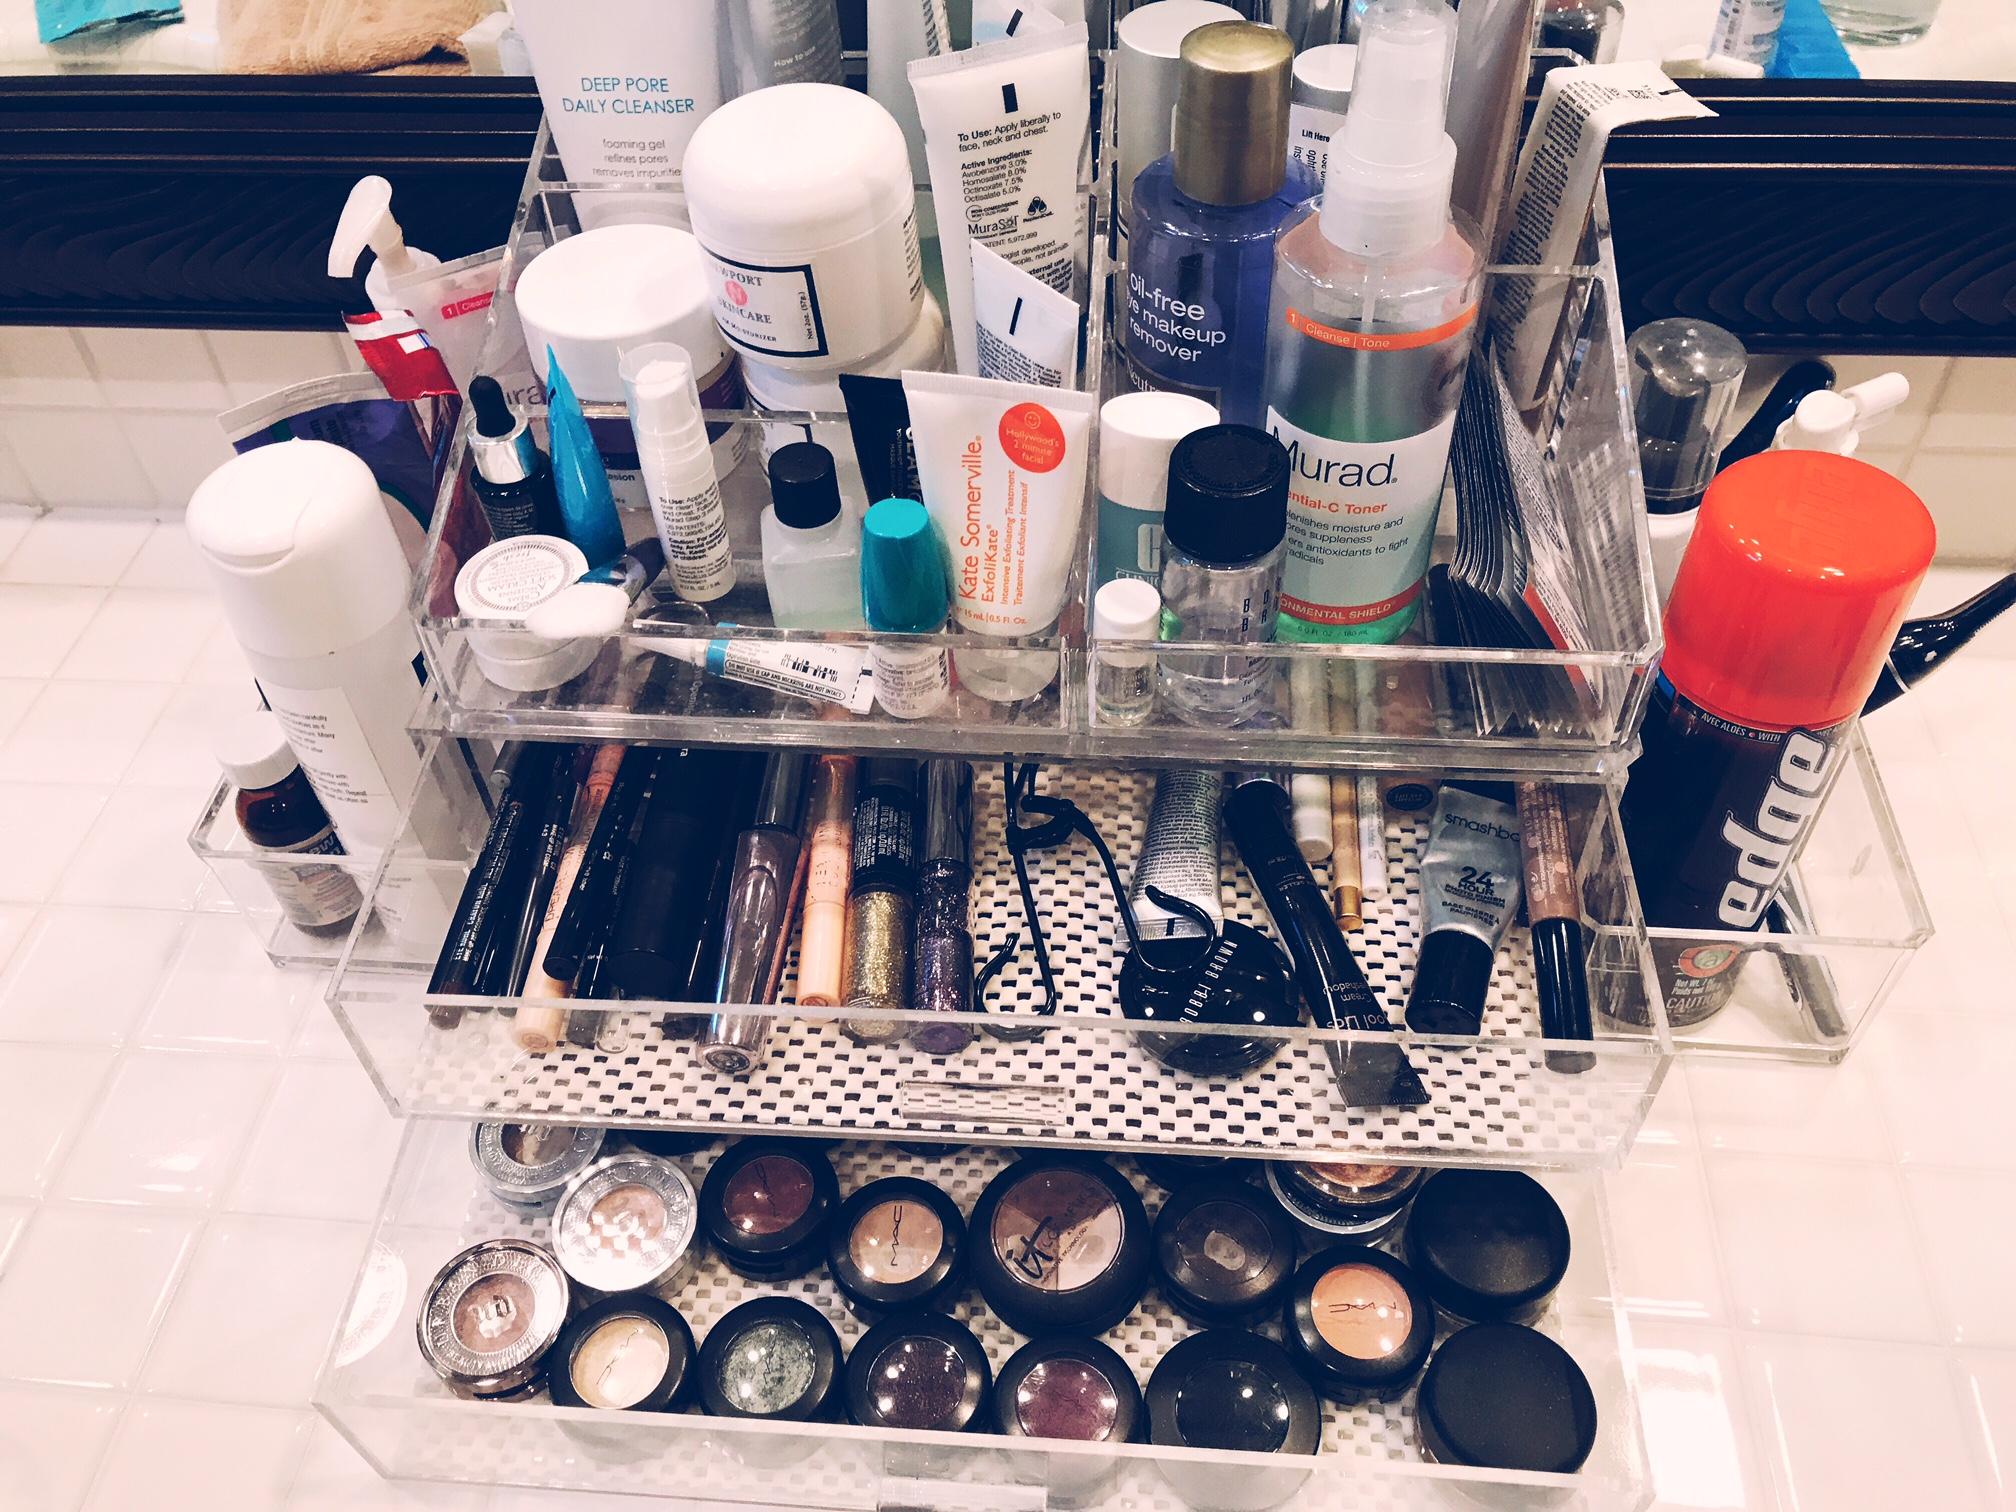 Acrylic organizer drawers and trays